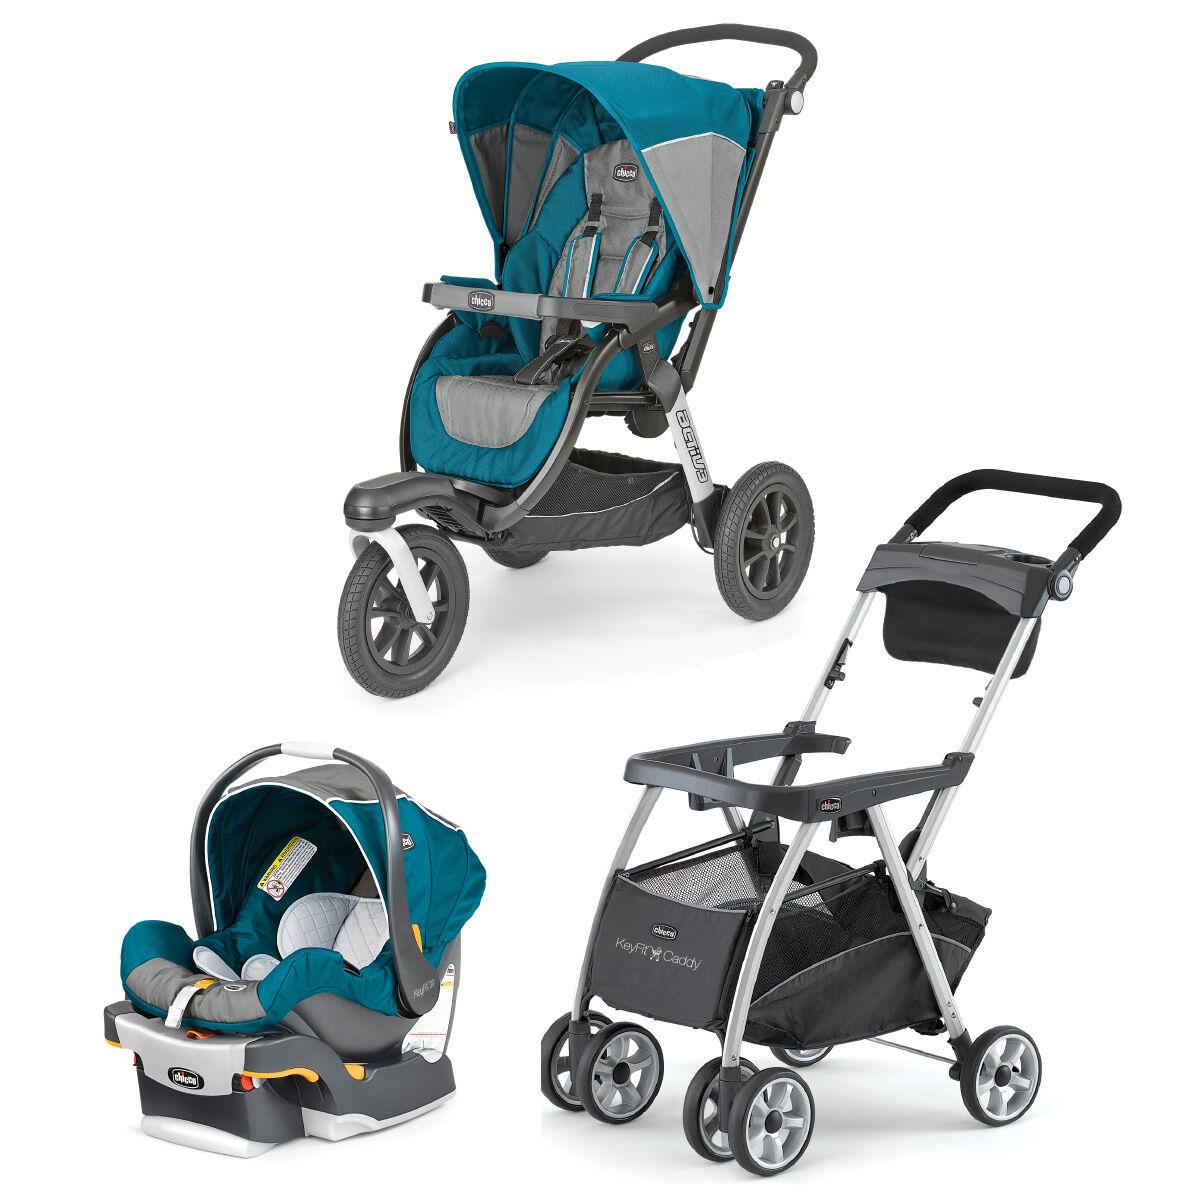 chicco polaris keyfit  infant car seat activ jogging stroller  - polaris keyfit  infant car seat  activ jogging stroller bundle  freecaddypolaris keyfit  infant car seat and activ jogging stroller withfree